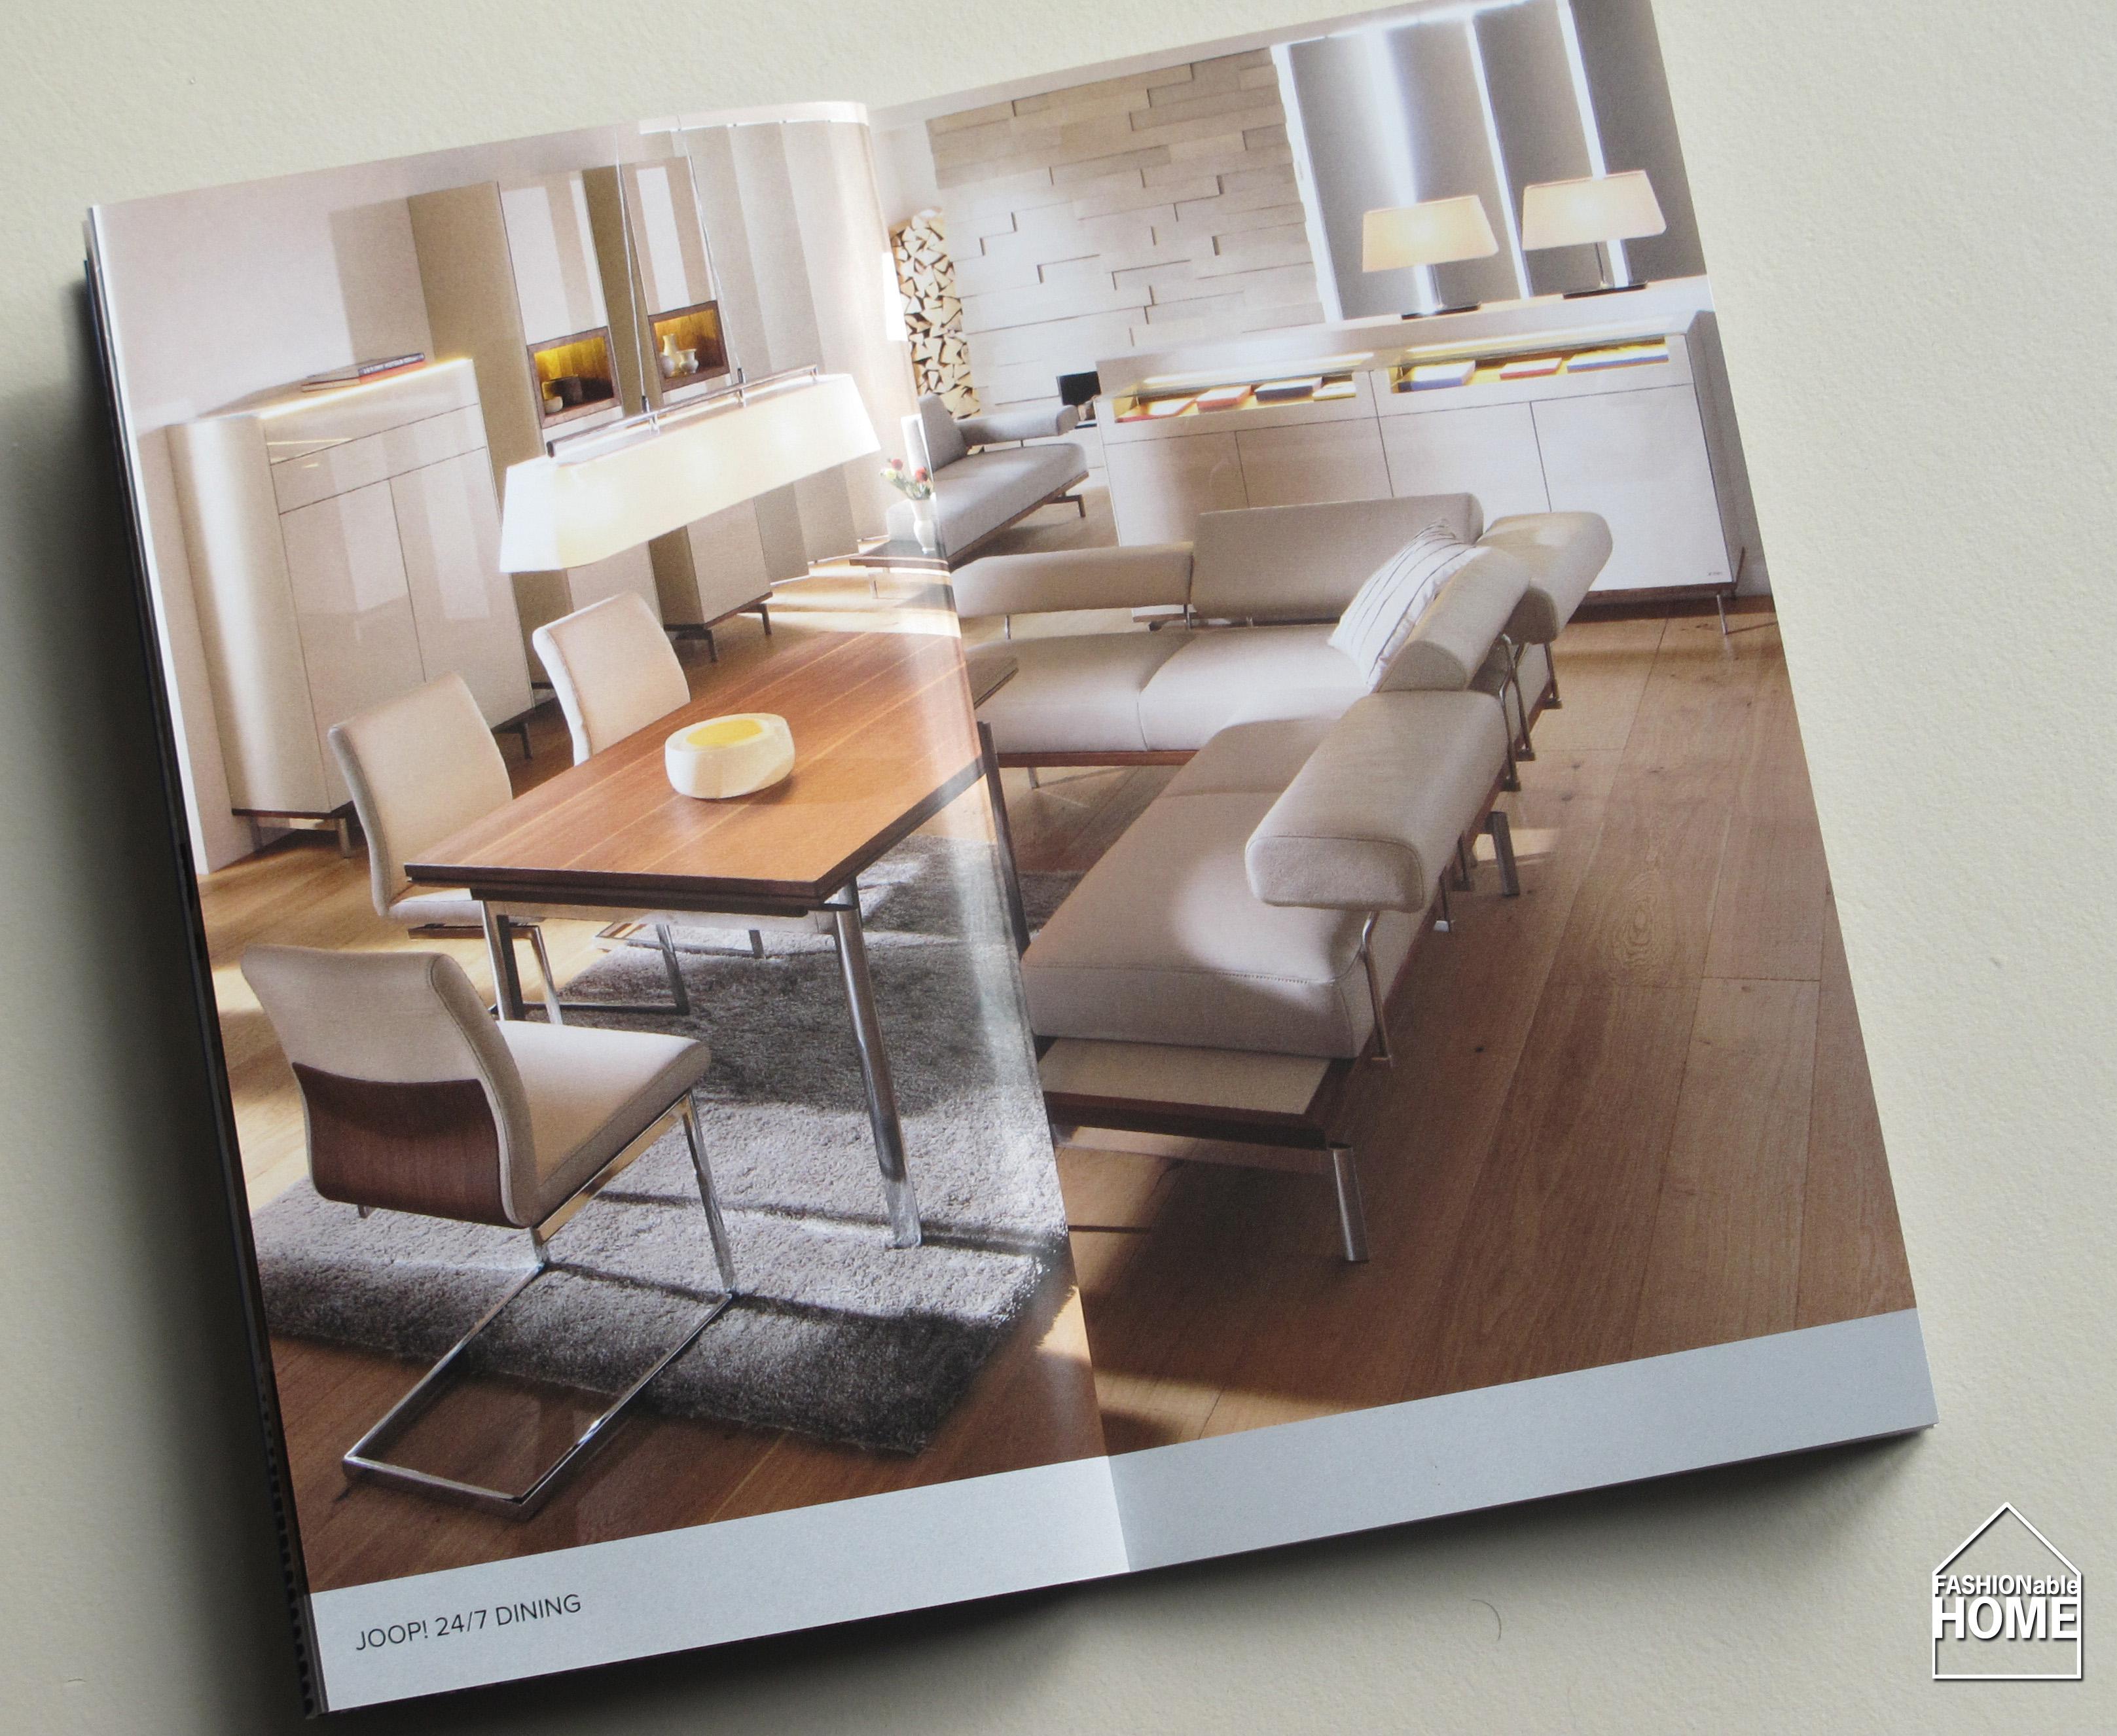 JOOP! LIVING 2013 – NEW IMAGES | Fashionable Home Blog